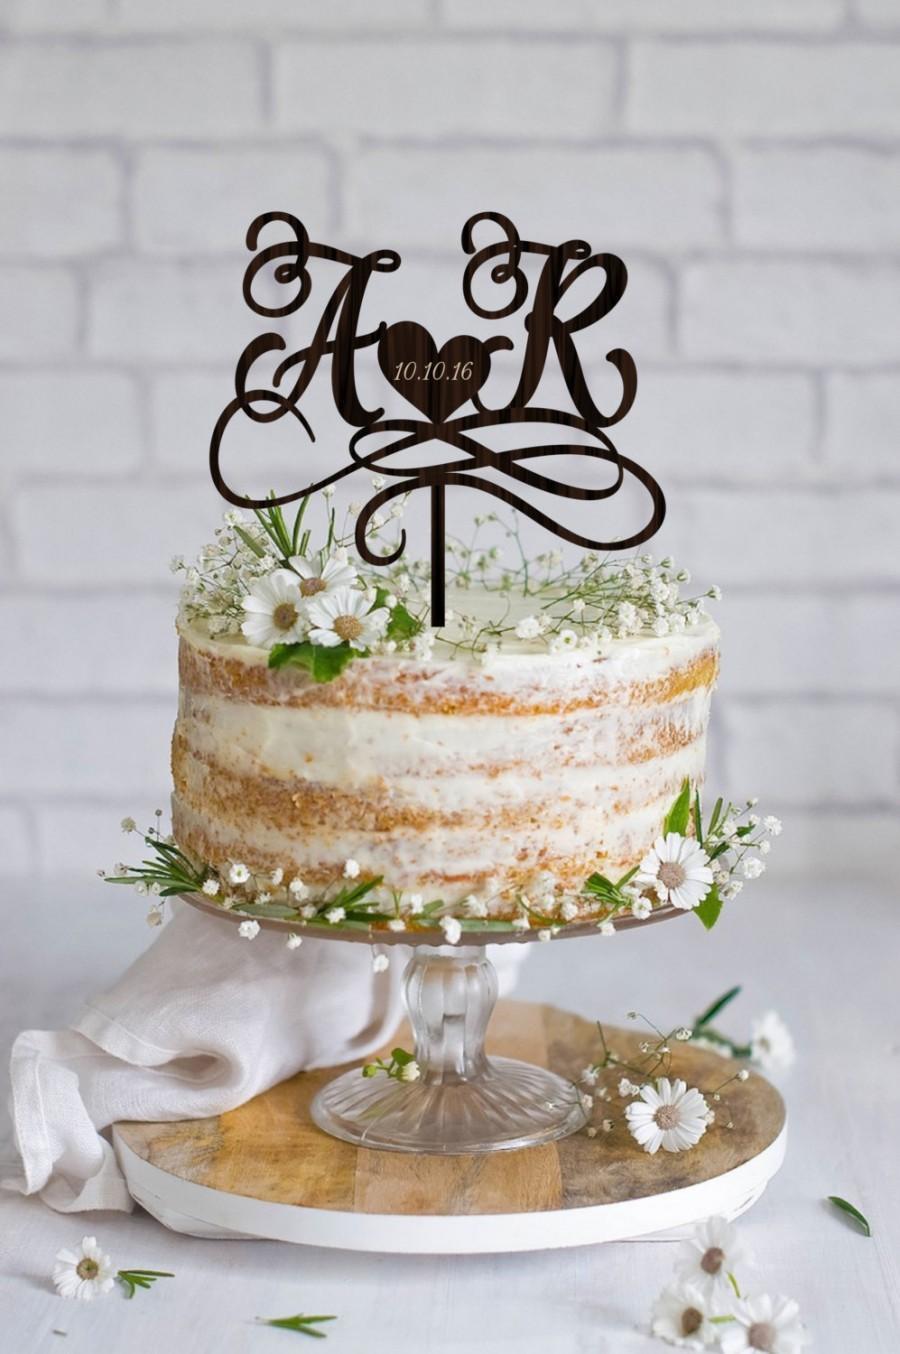 Свадьба - Wedding Cake Topper  Initials    Cake Topper Names   Personalized  Wedding Cake Topper  Wood Cake Topper Monogram